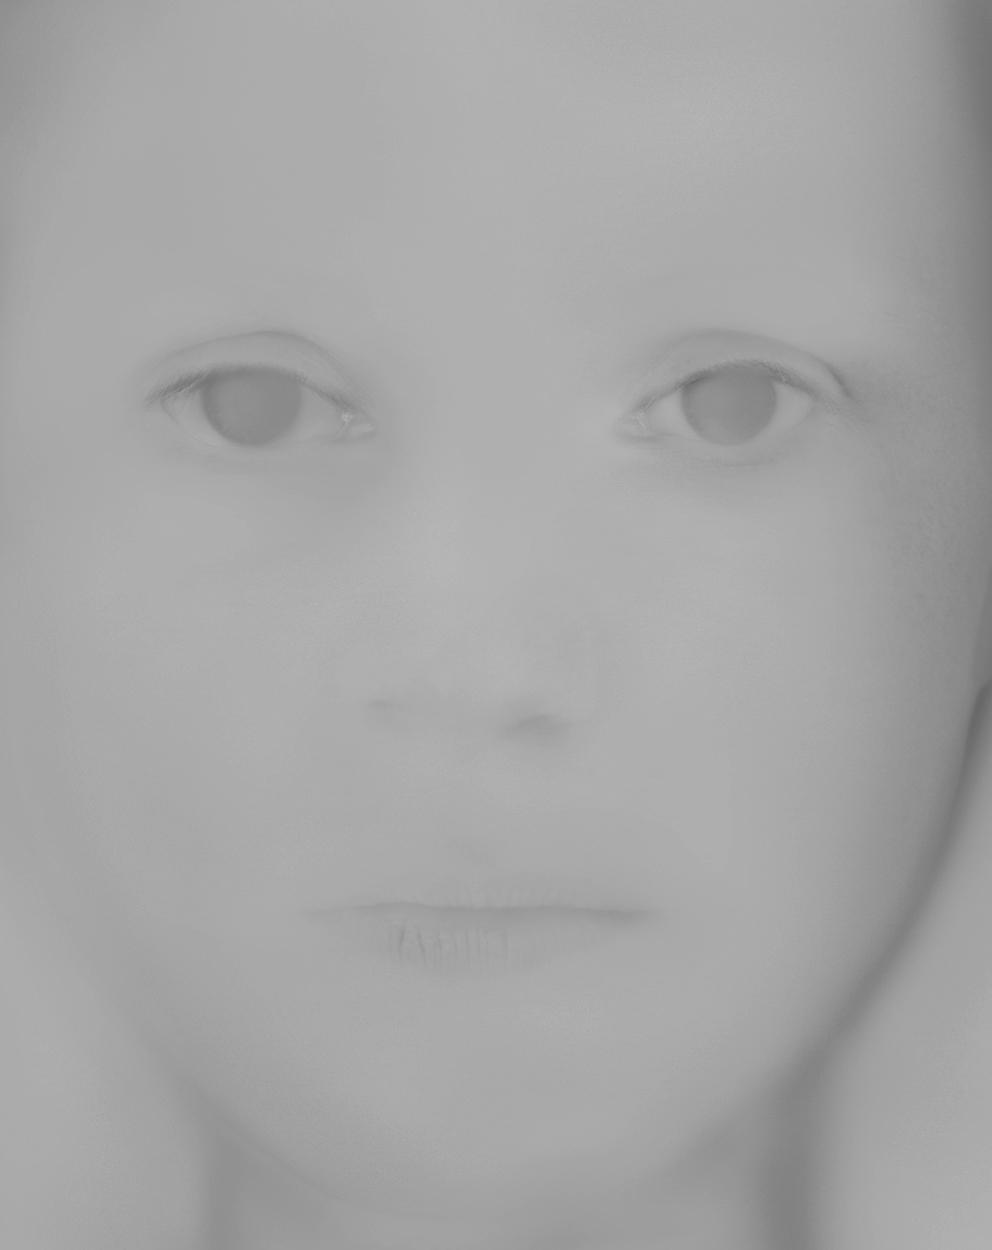 Yotta Kippe | 0906, 125 x 100 cm, Ilfojet print on metal foil / aludibond, graphite